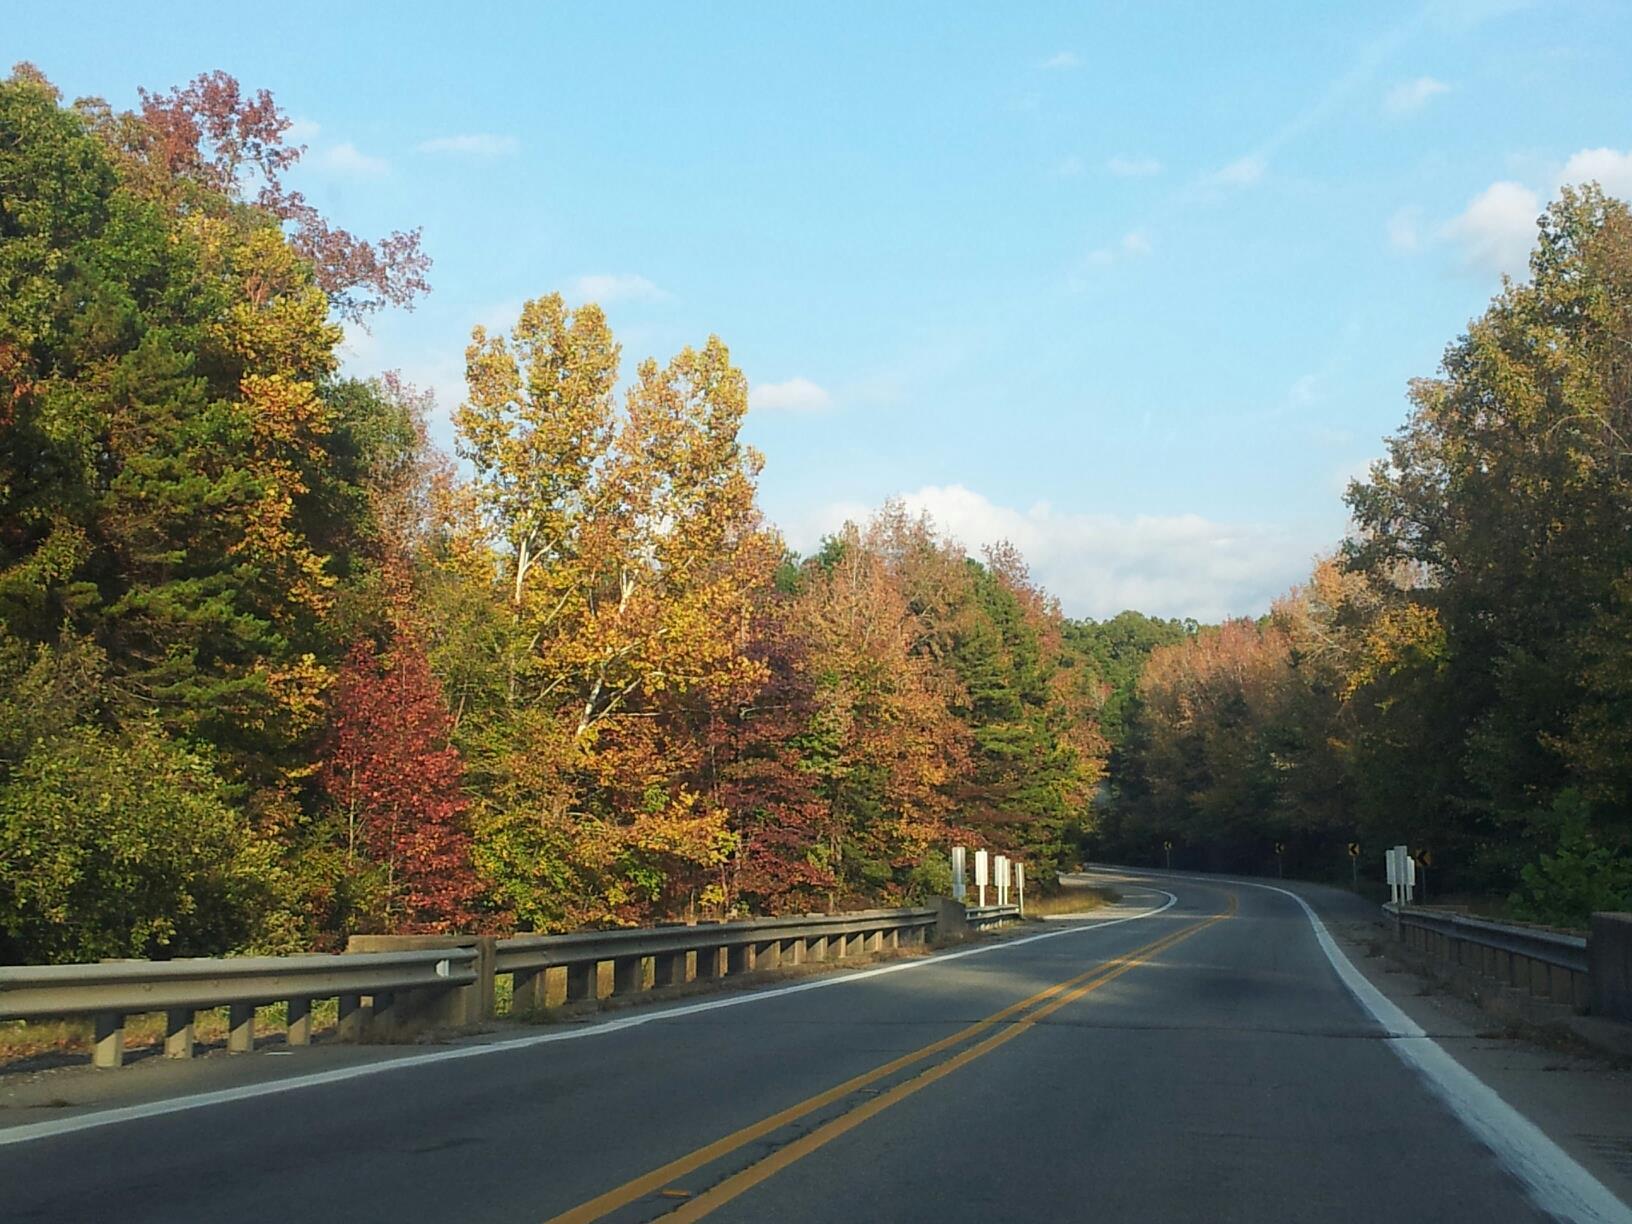 The open road in Arkansas.